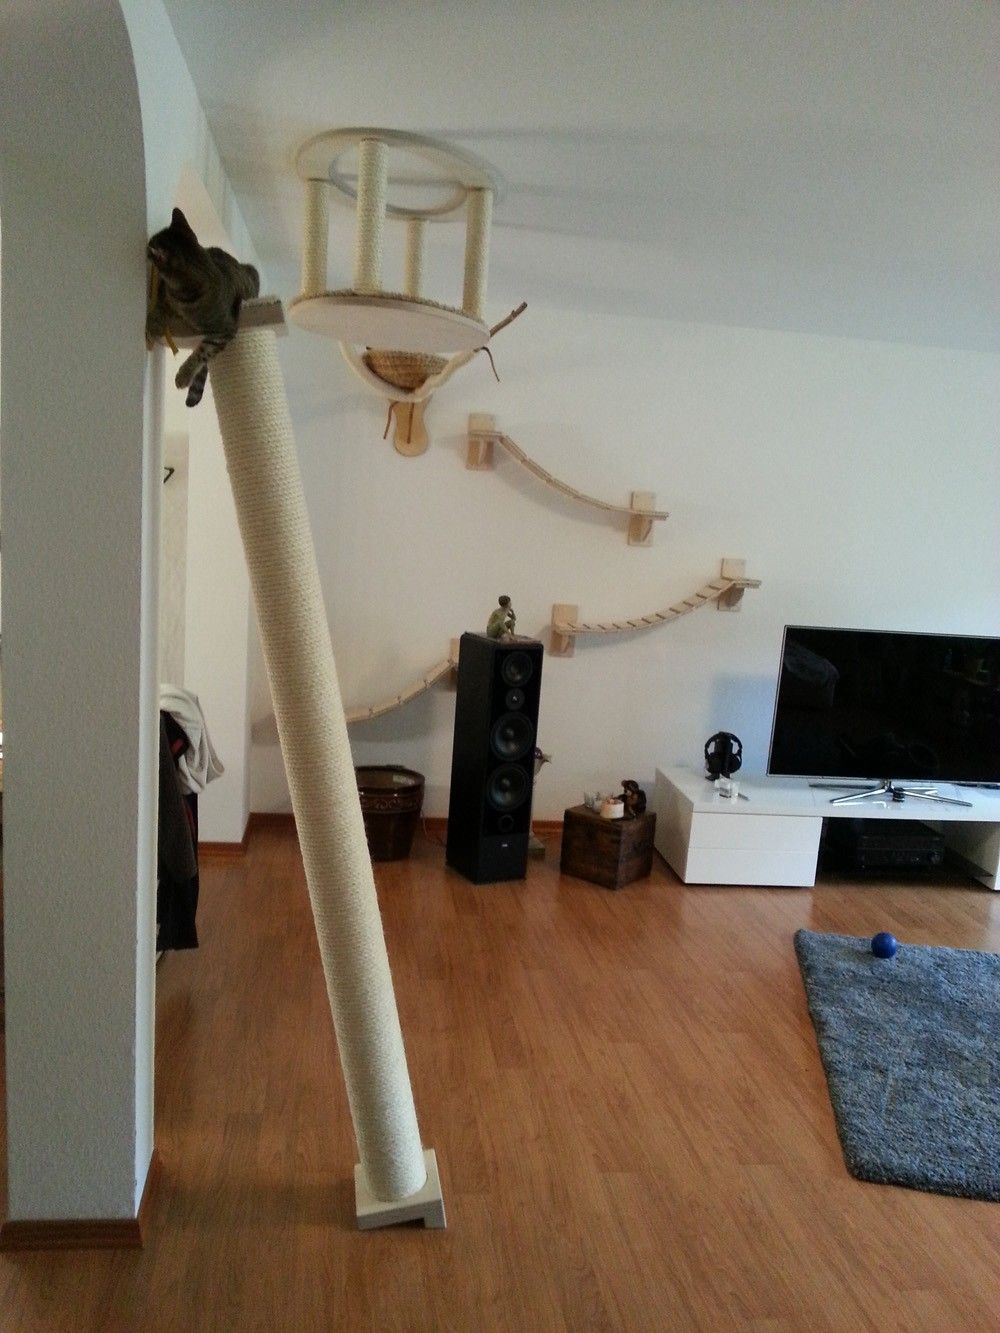 katzenm bel kletters ule sisal kratzbaum stabil langlebig katzengerecht katzenm bel. Black Bedroom Furniture Sets. Home Design Ideas